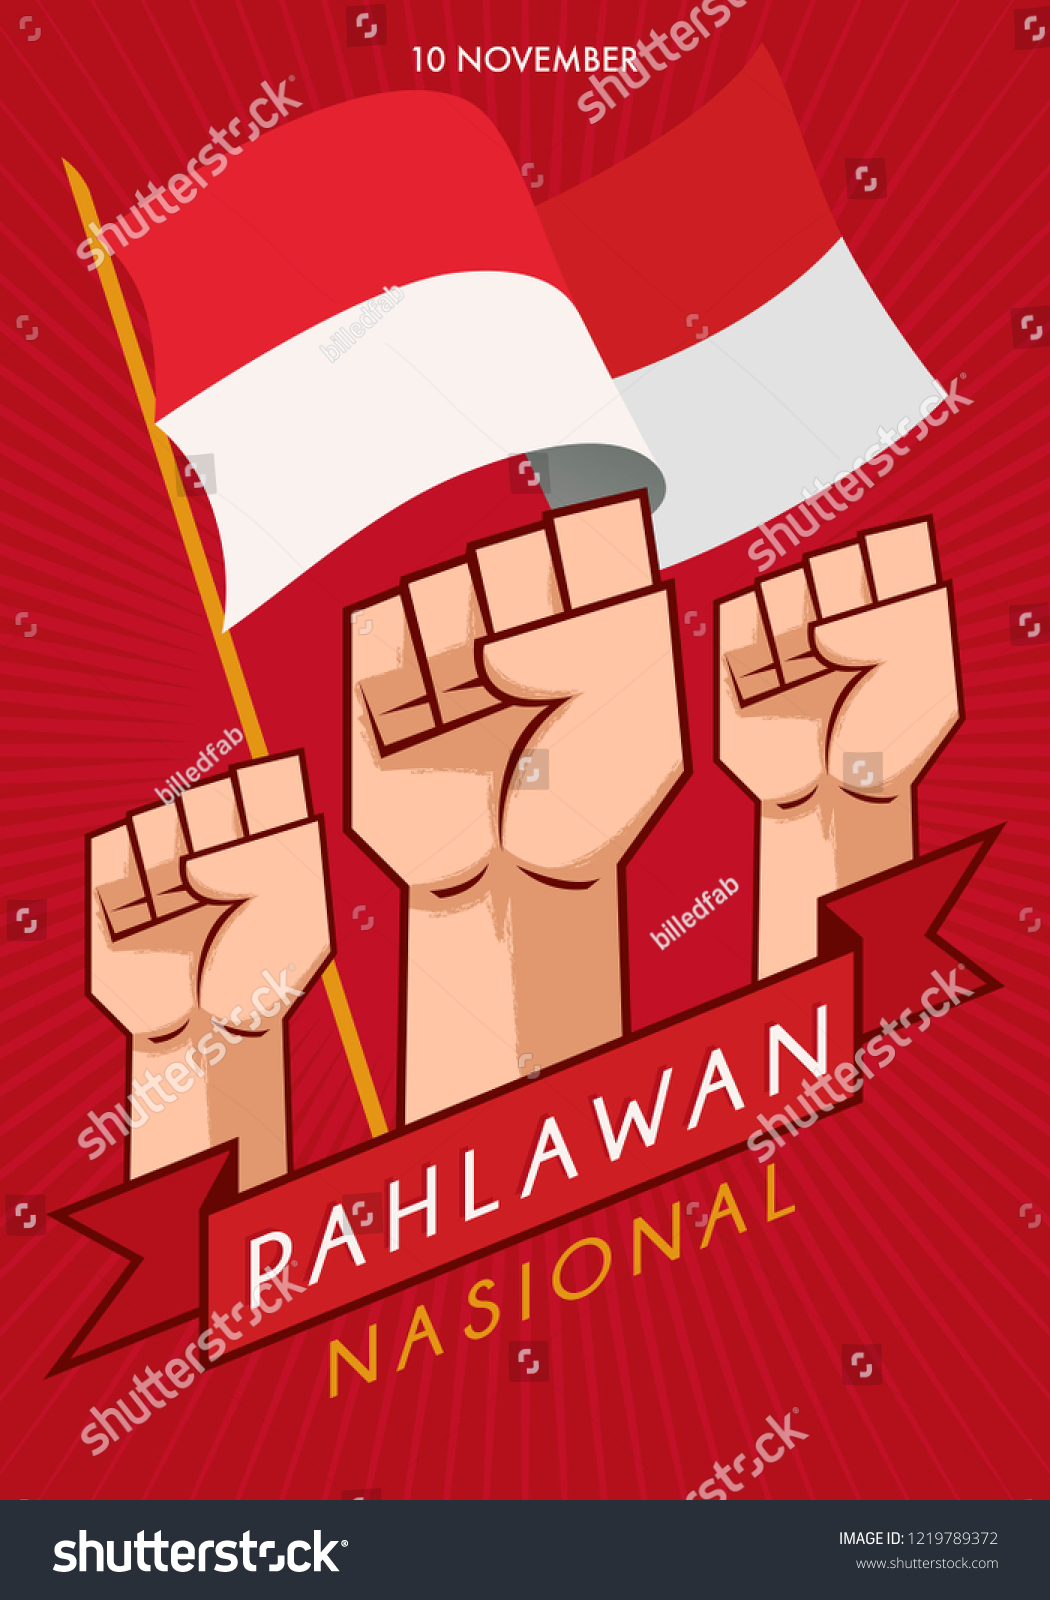 Background Hari Pahlawan : background, pahlawan, Commemorating, Pahlawan, Nasional, Indonesian, National, Heroes, Stock, Vector, (Royalty, Free), 1219789372